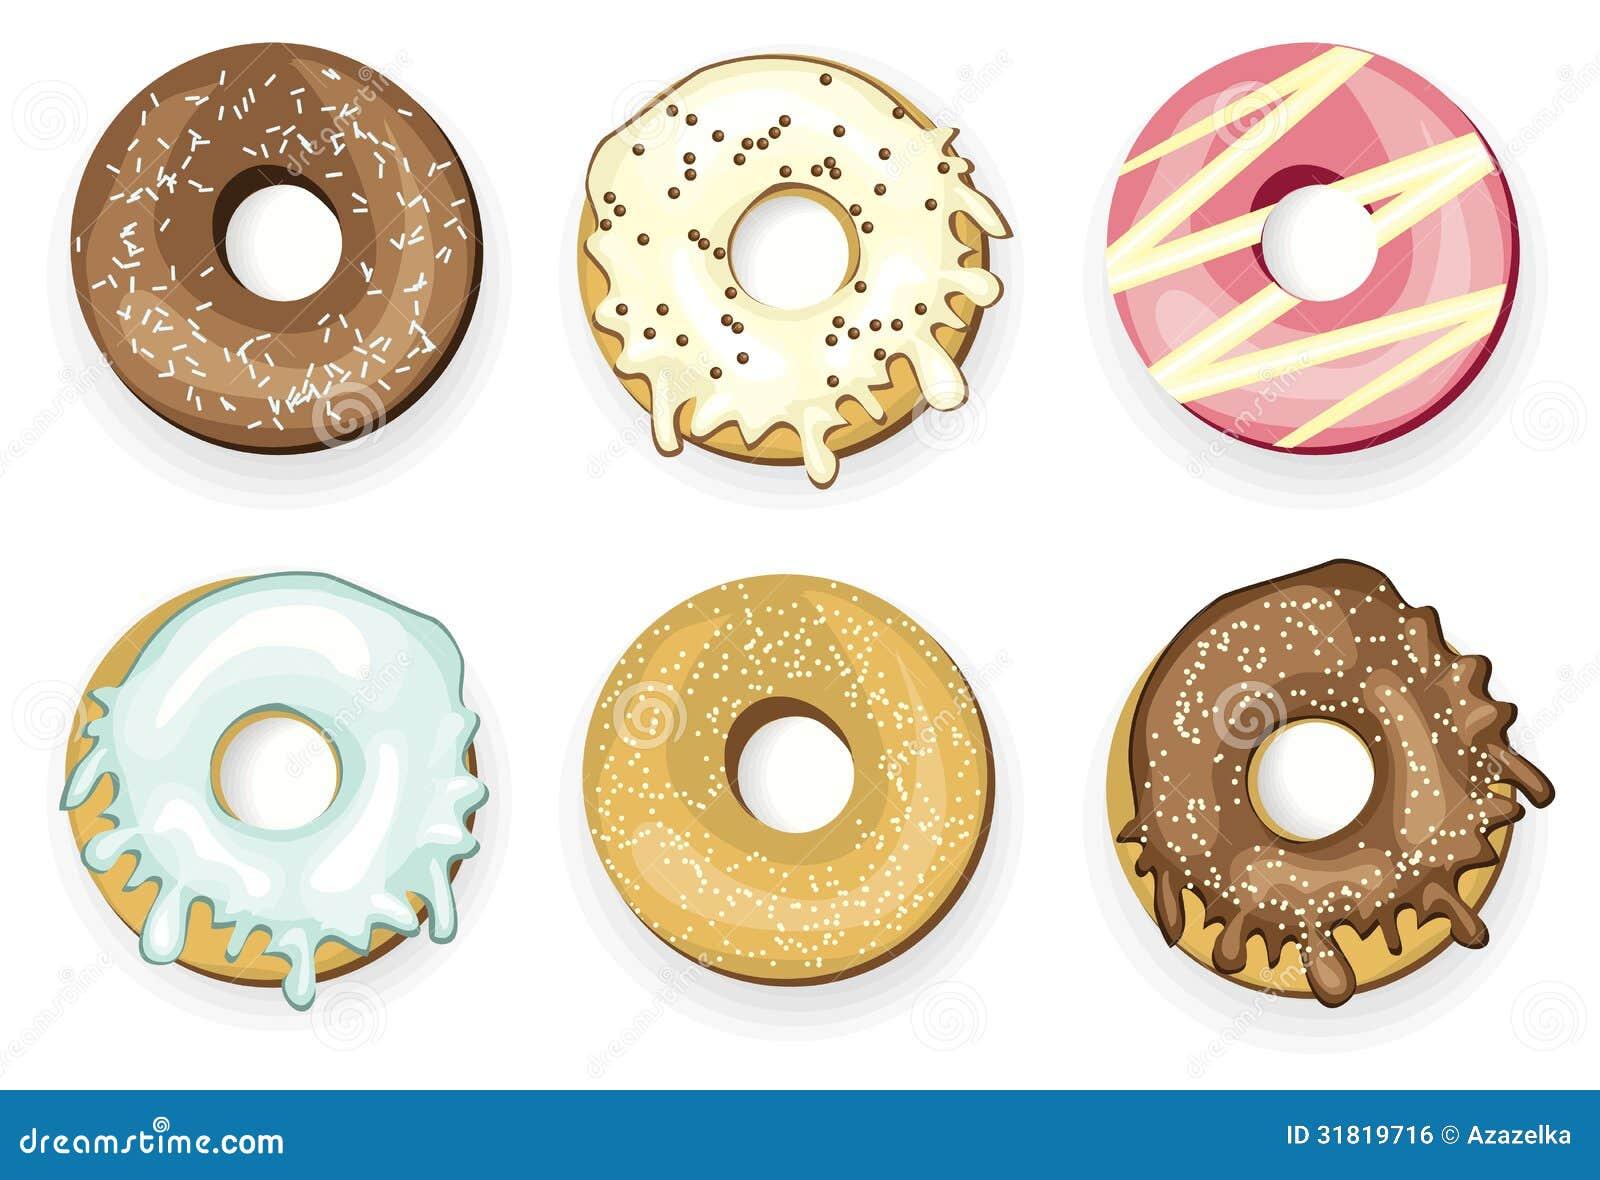 Donuts Royalty Free Stock Image - Image: 31819716